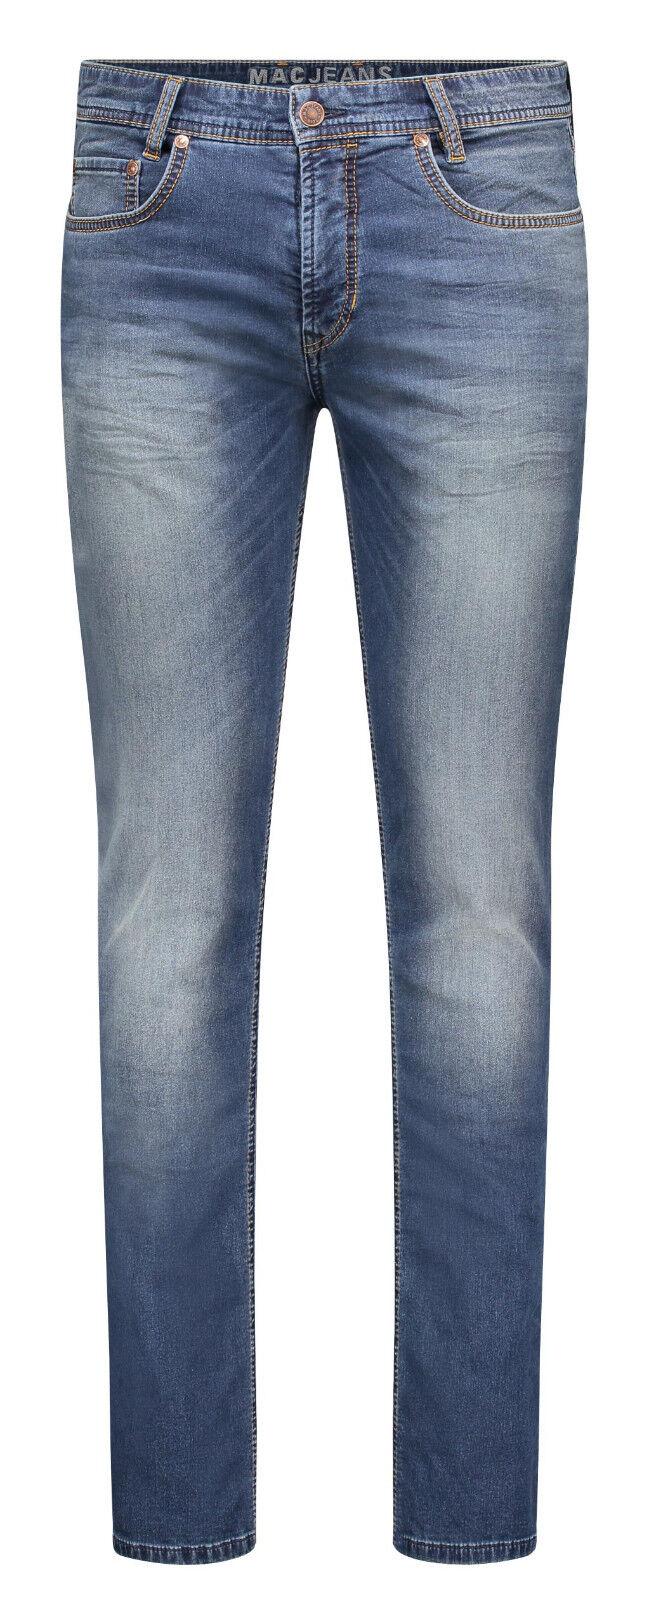 MAC Herren Jeans Jog´N Jeans 0590 0590 0590 Blau grau authentic H786 Alle Größen Längen 70bdd7